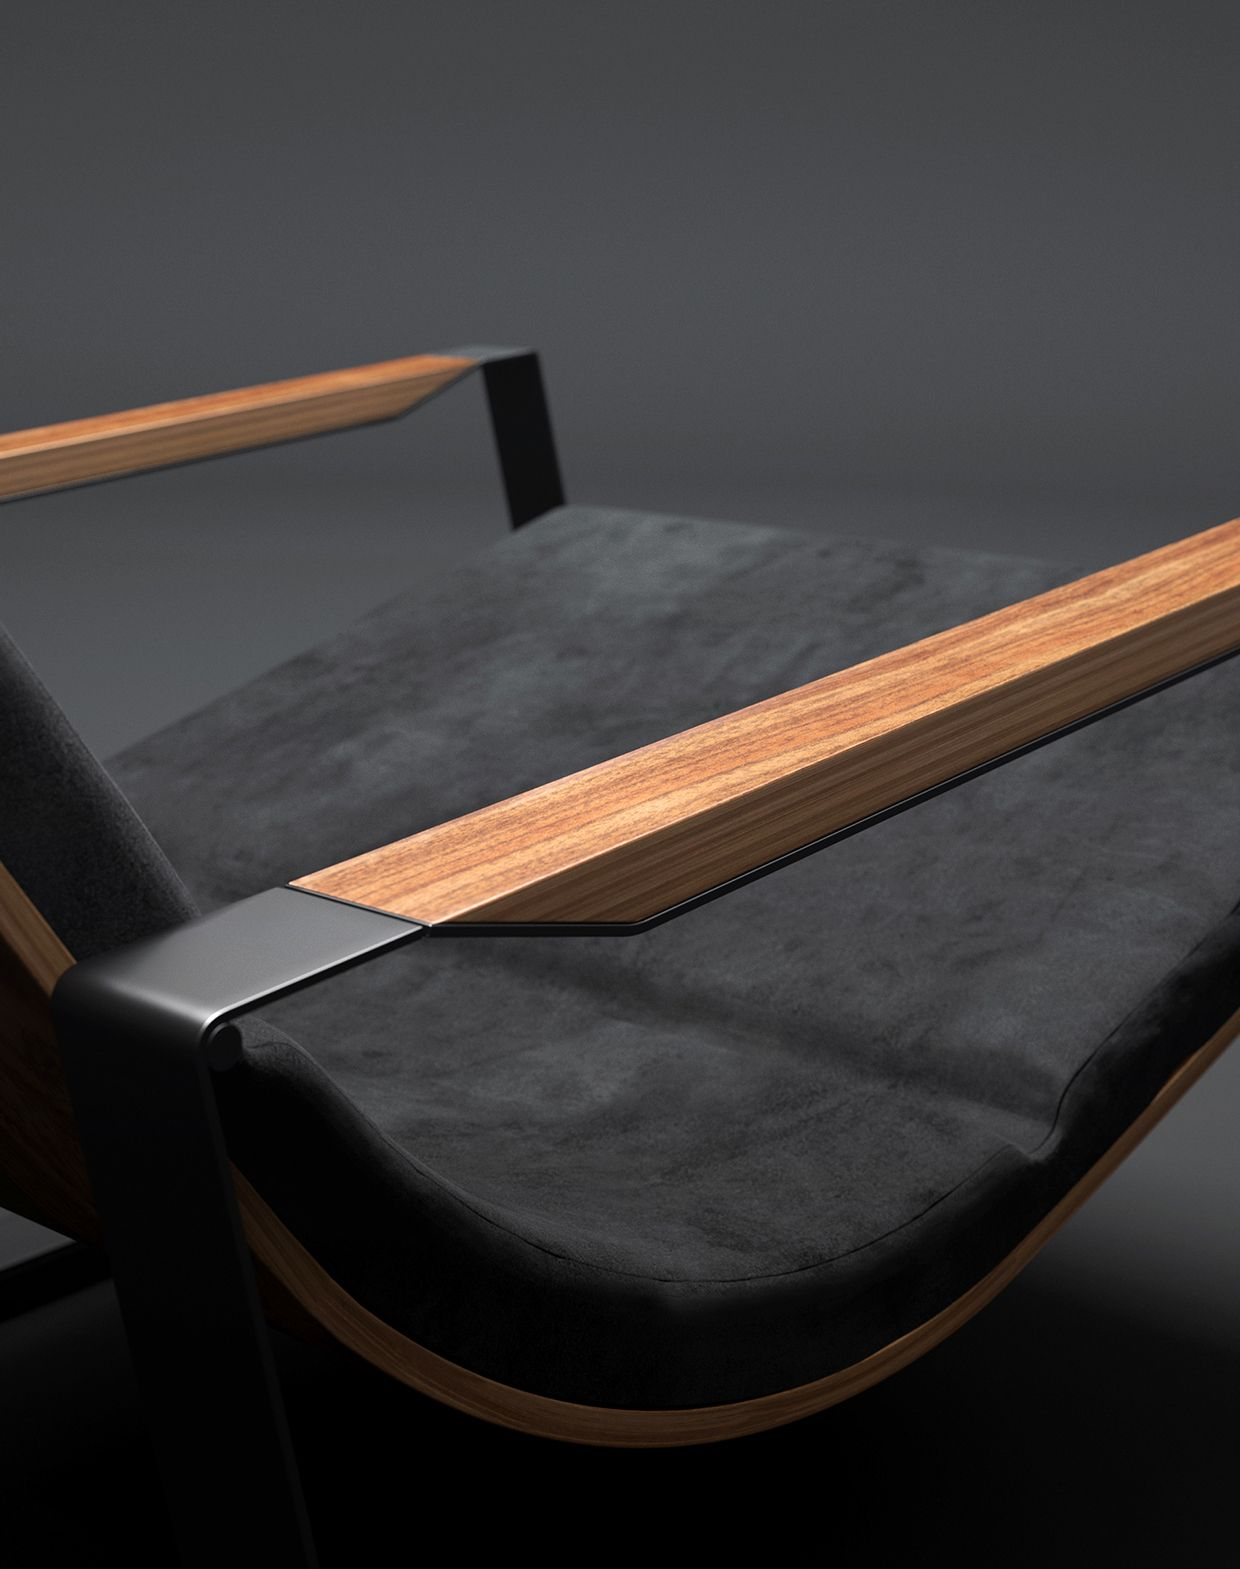 Le Industrial Design le container furniture industrial design industrial